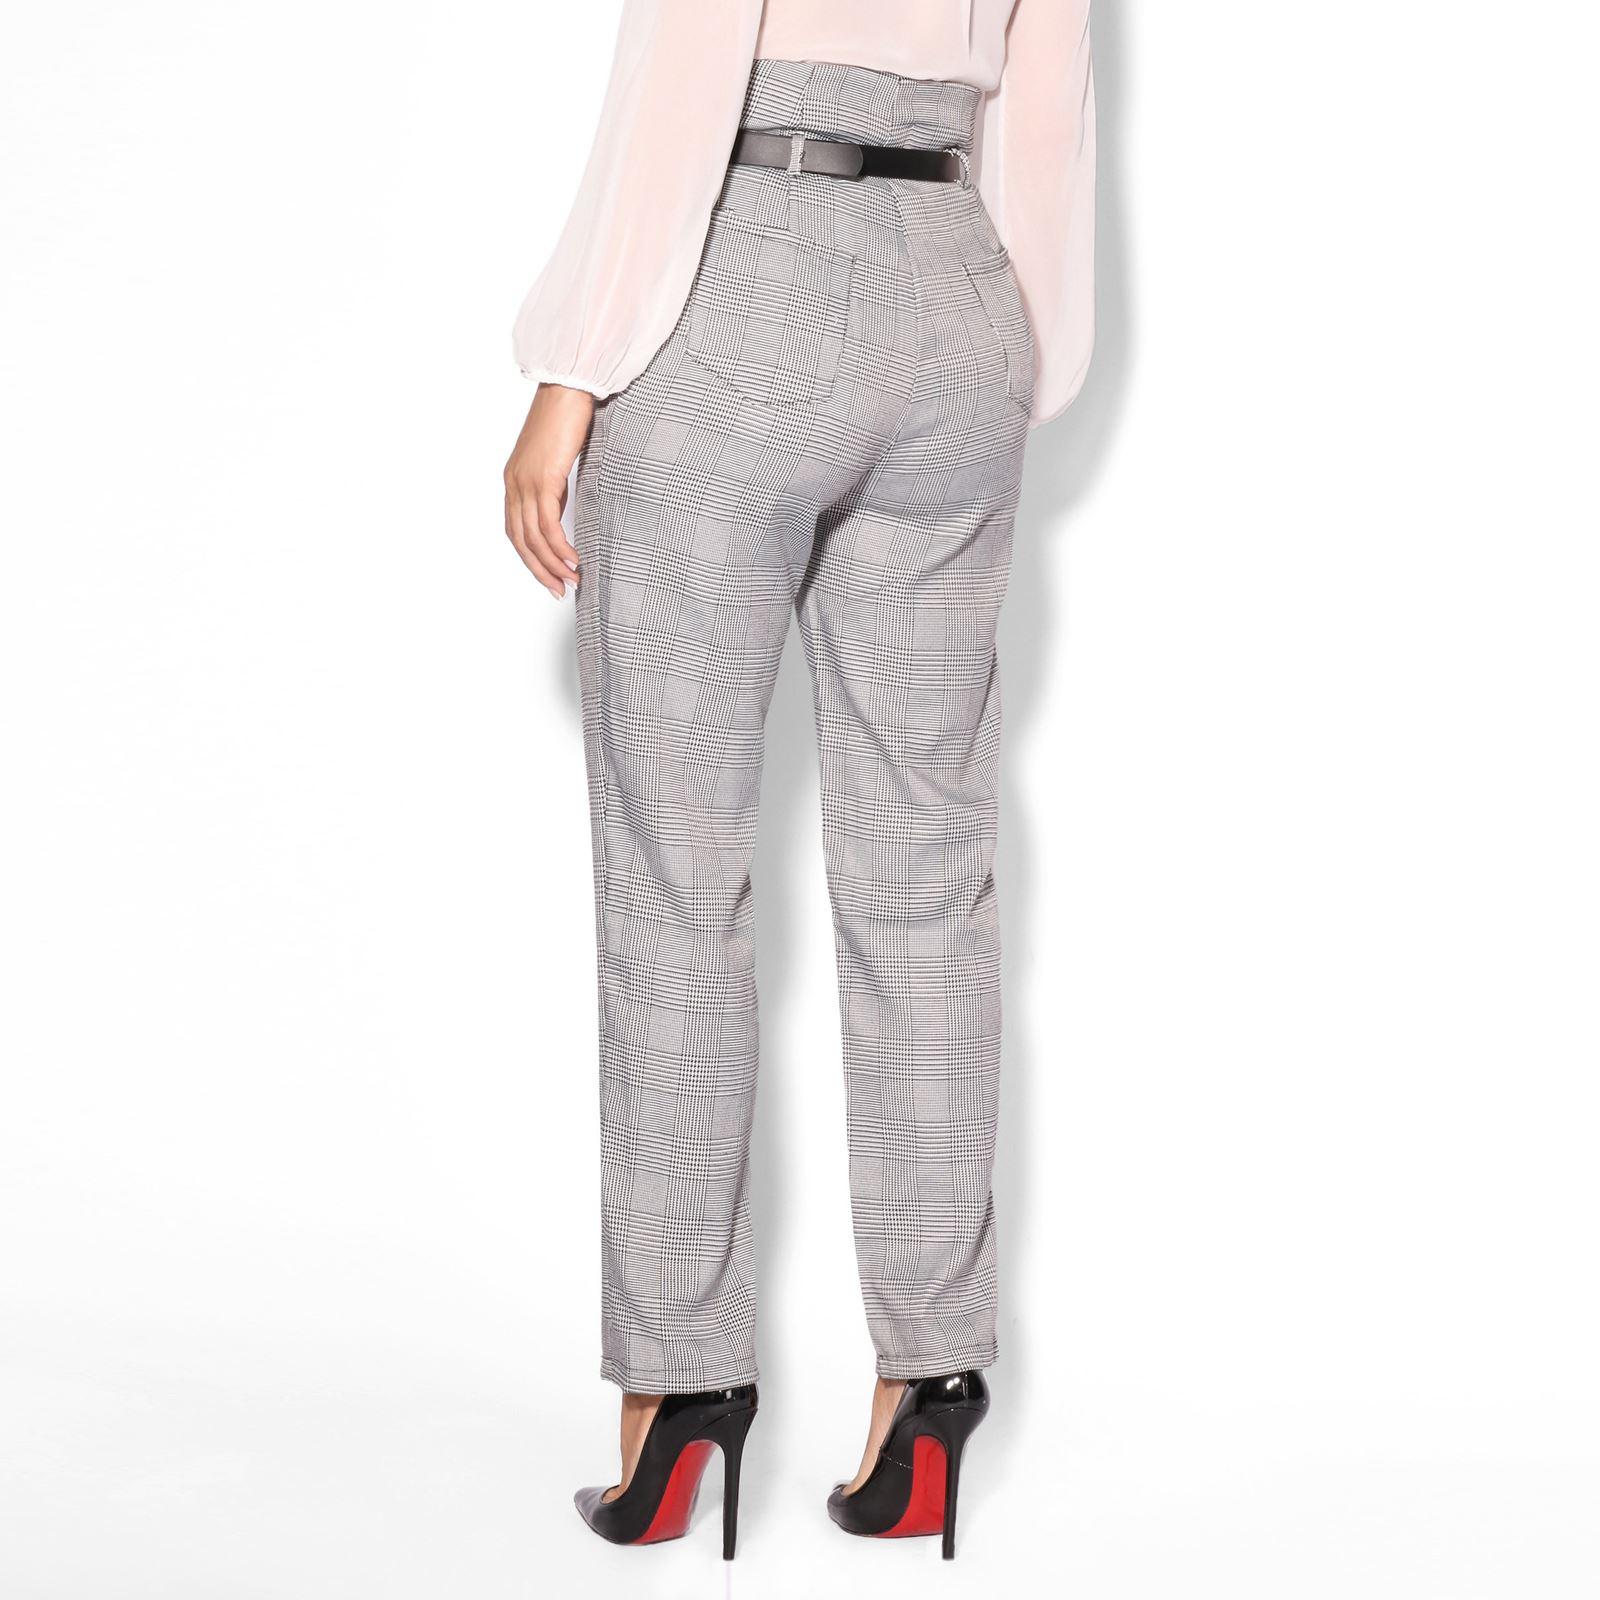 8be449015c43 Women Belted Paper Bag High Waist Tartan Check Cigarette Trousers ...